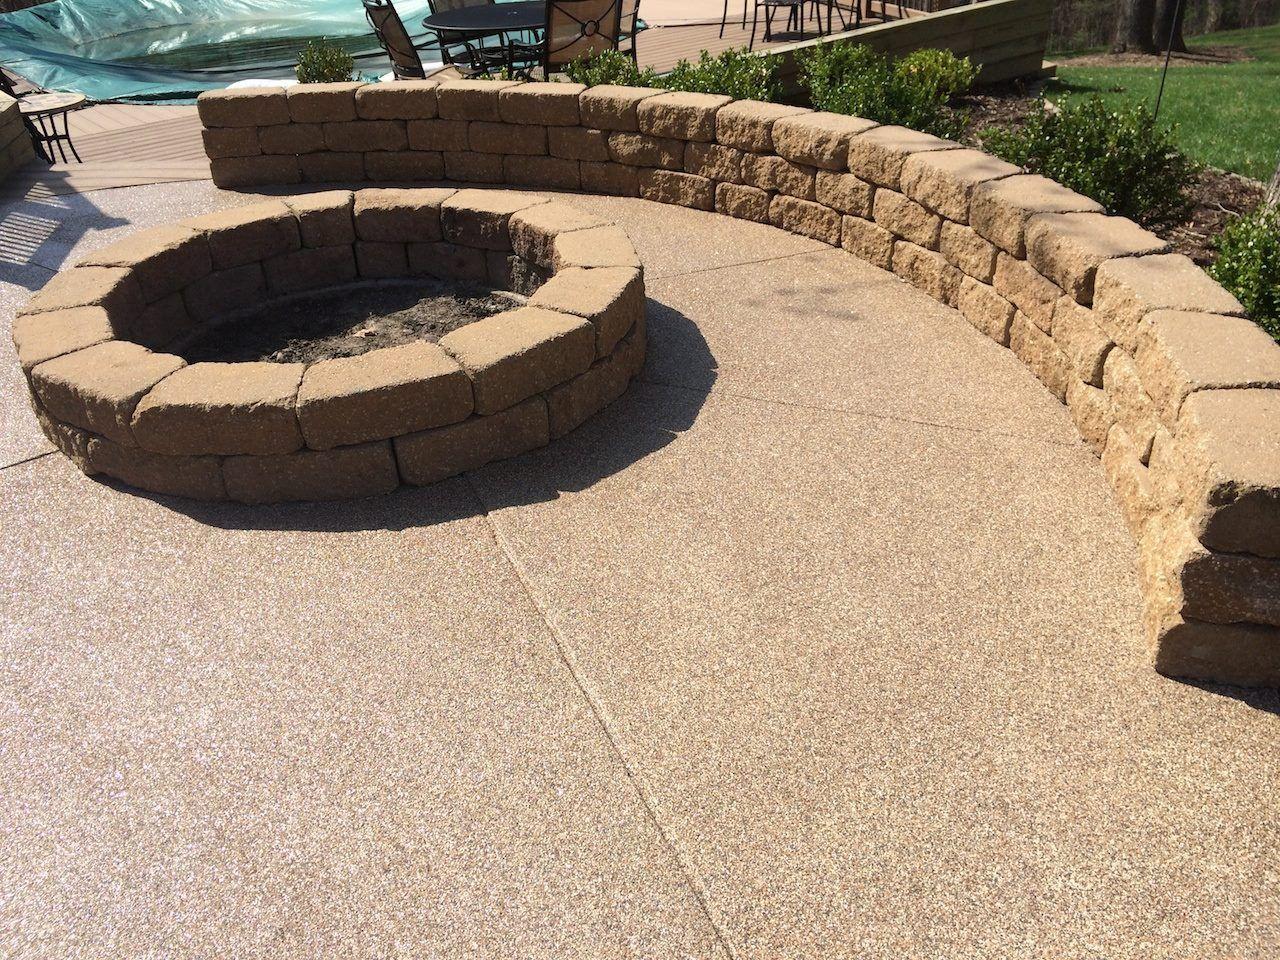 Concrete Resurfacing Epoxy Flooring Peoria Bloomington Il Fire Pit Patio Backyard Fire Patio Projects